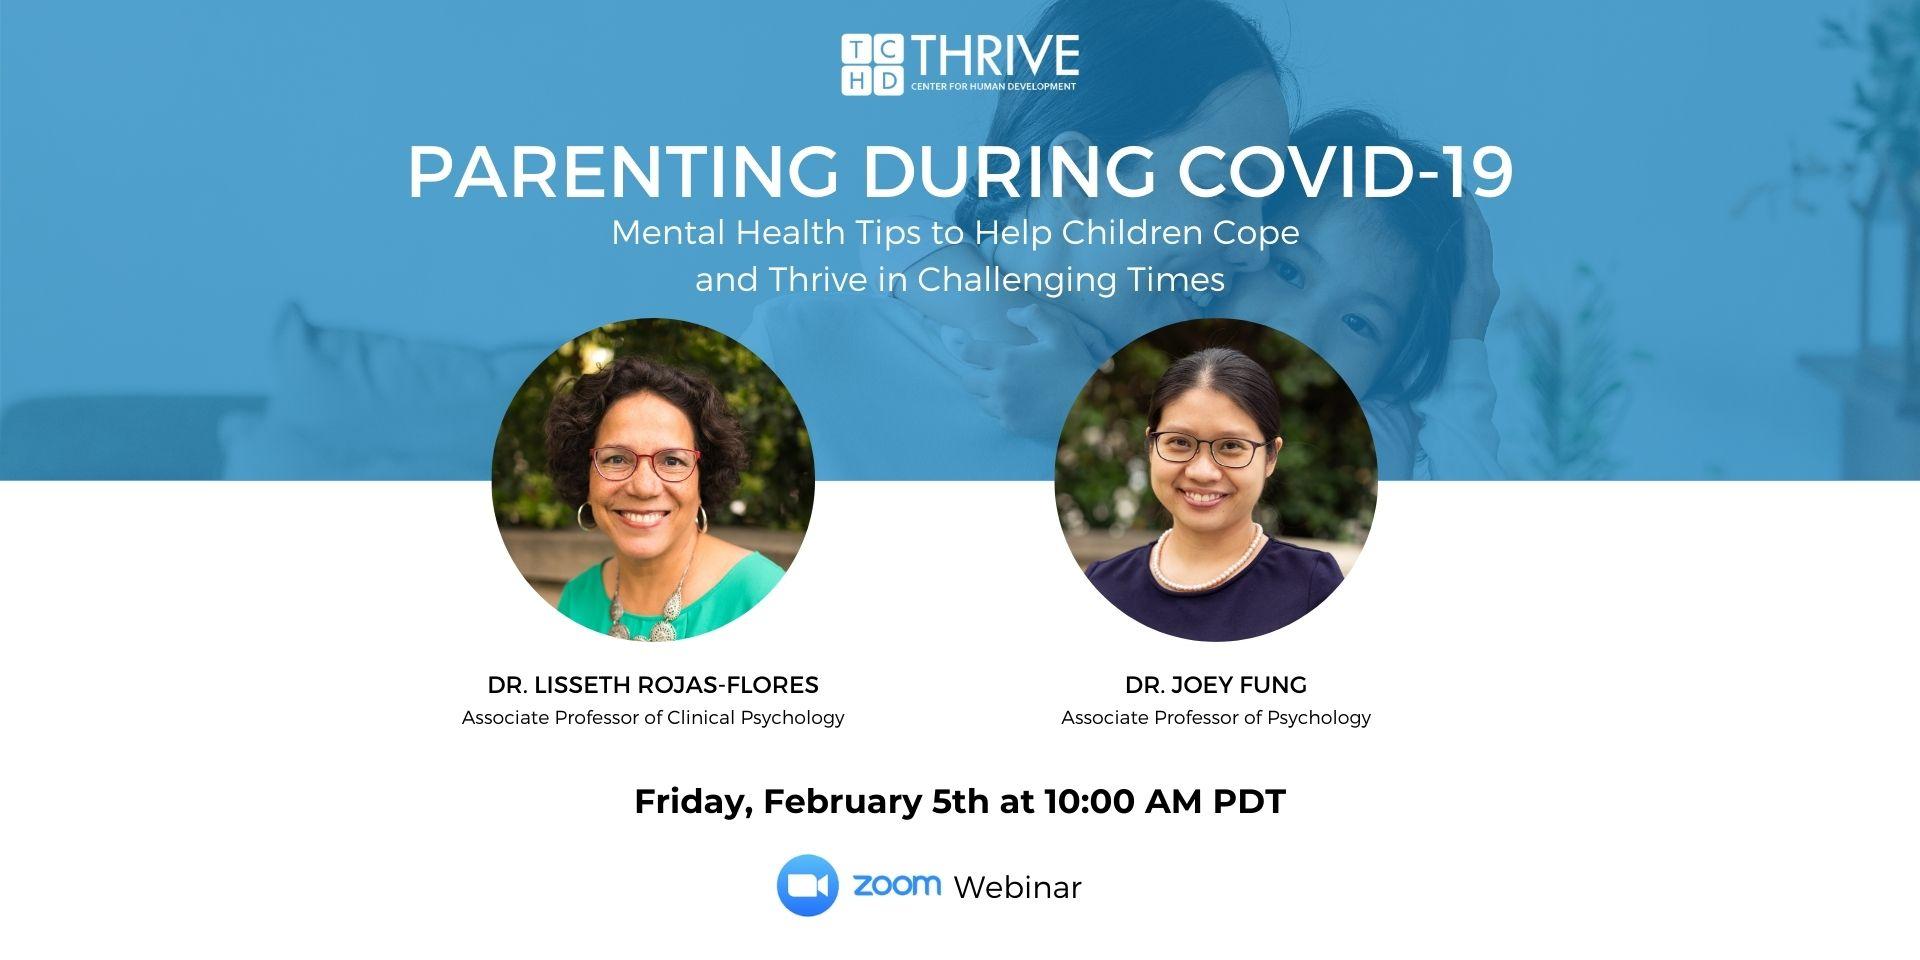 Parenting During COVID-19 Promo 1920x960